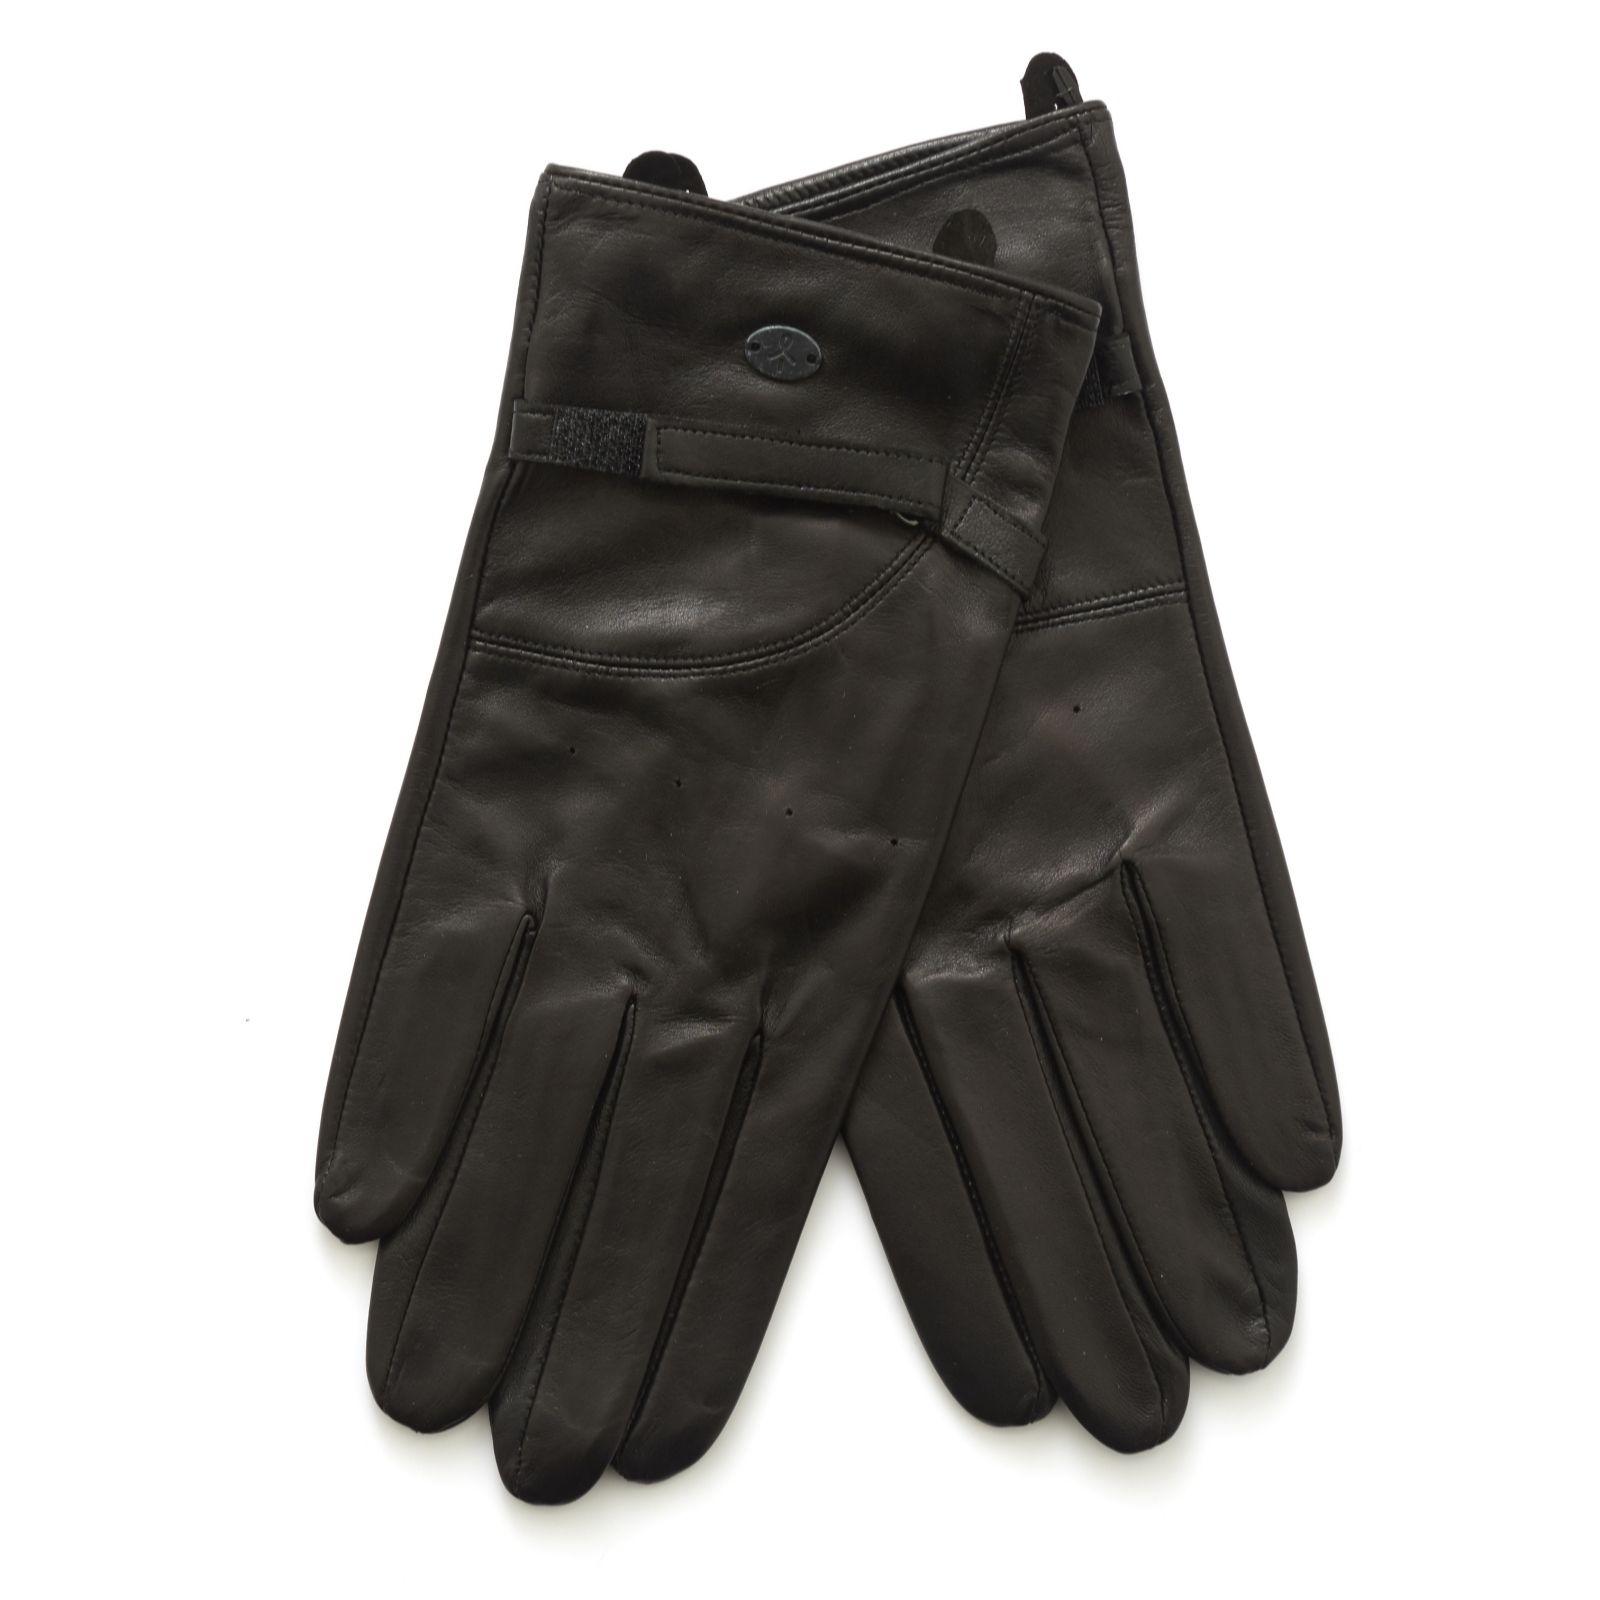 2a877efa04d71 Emu Ginrock Leather Gloves - QVC UK